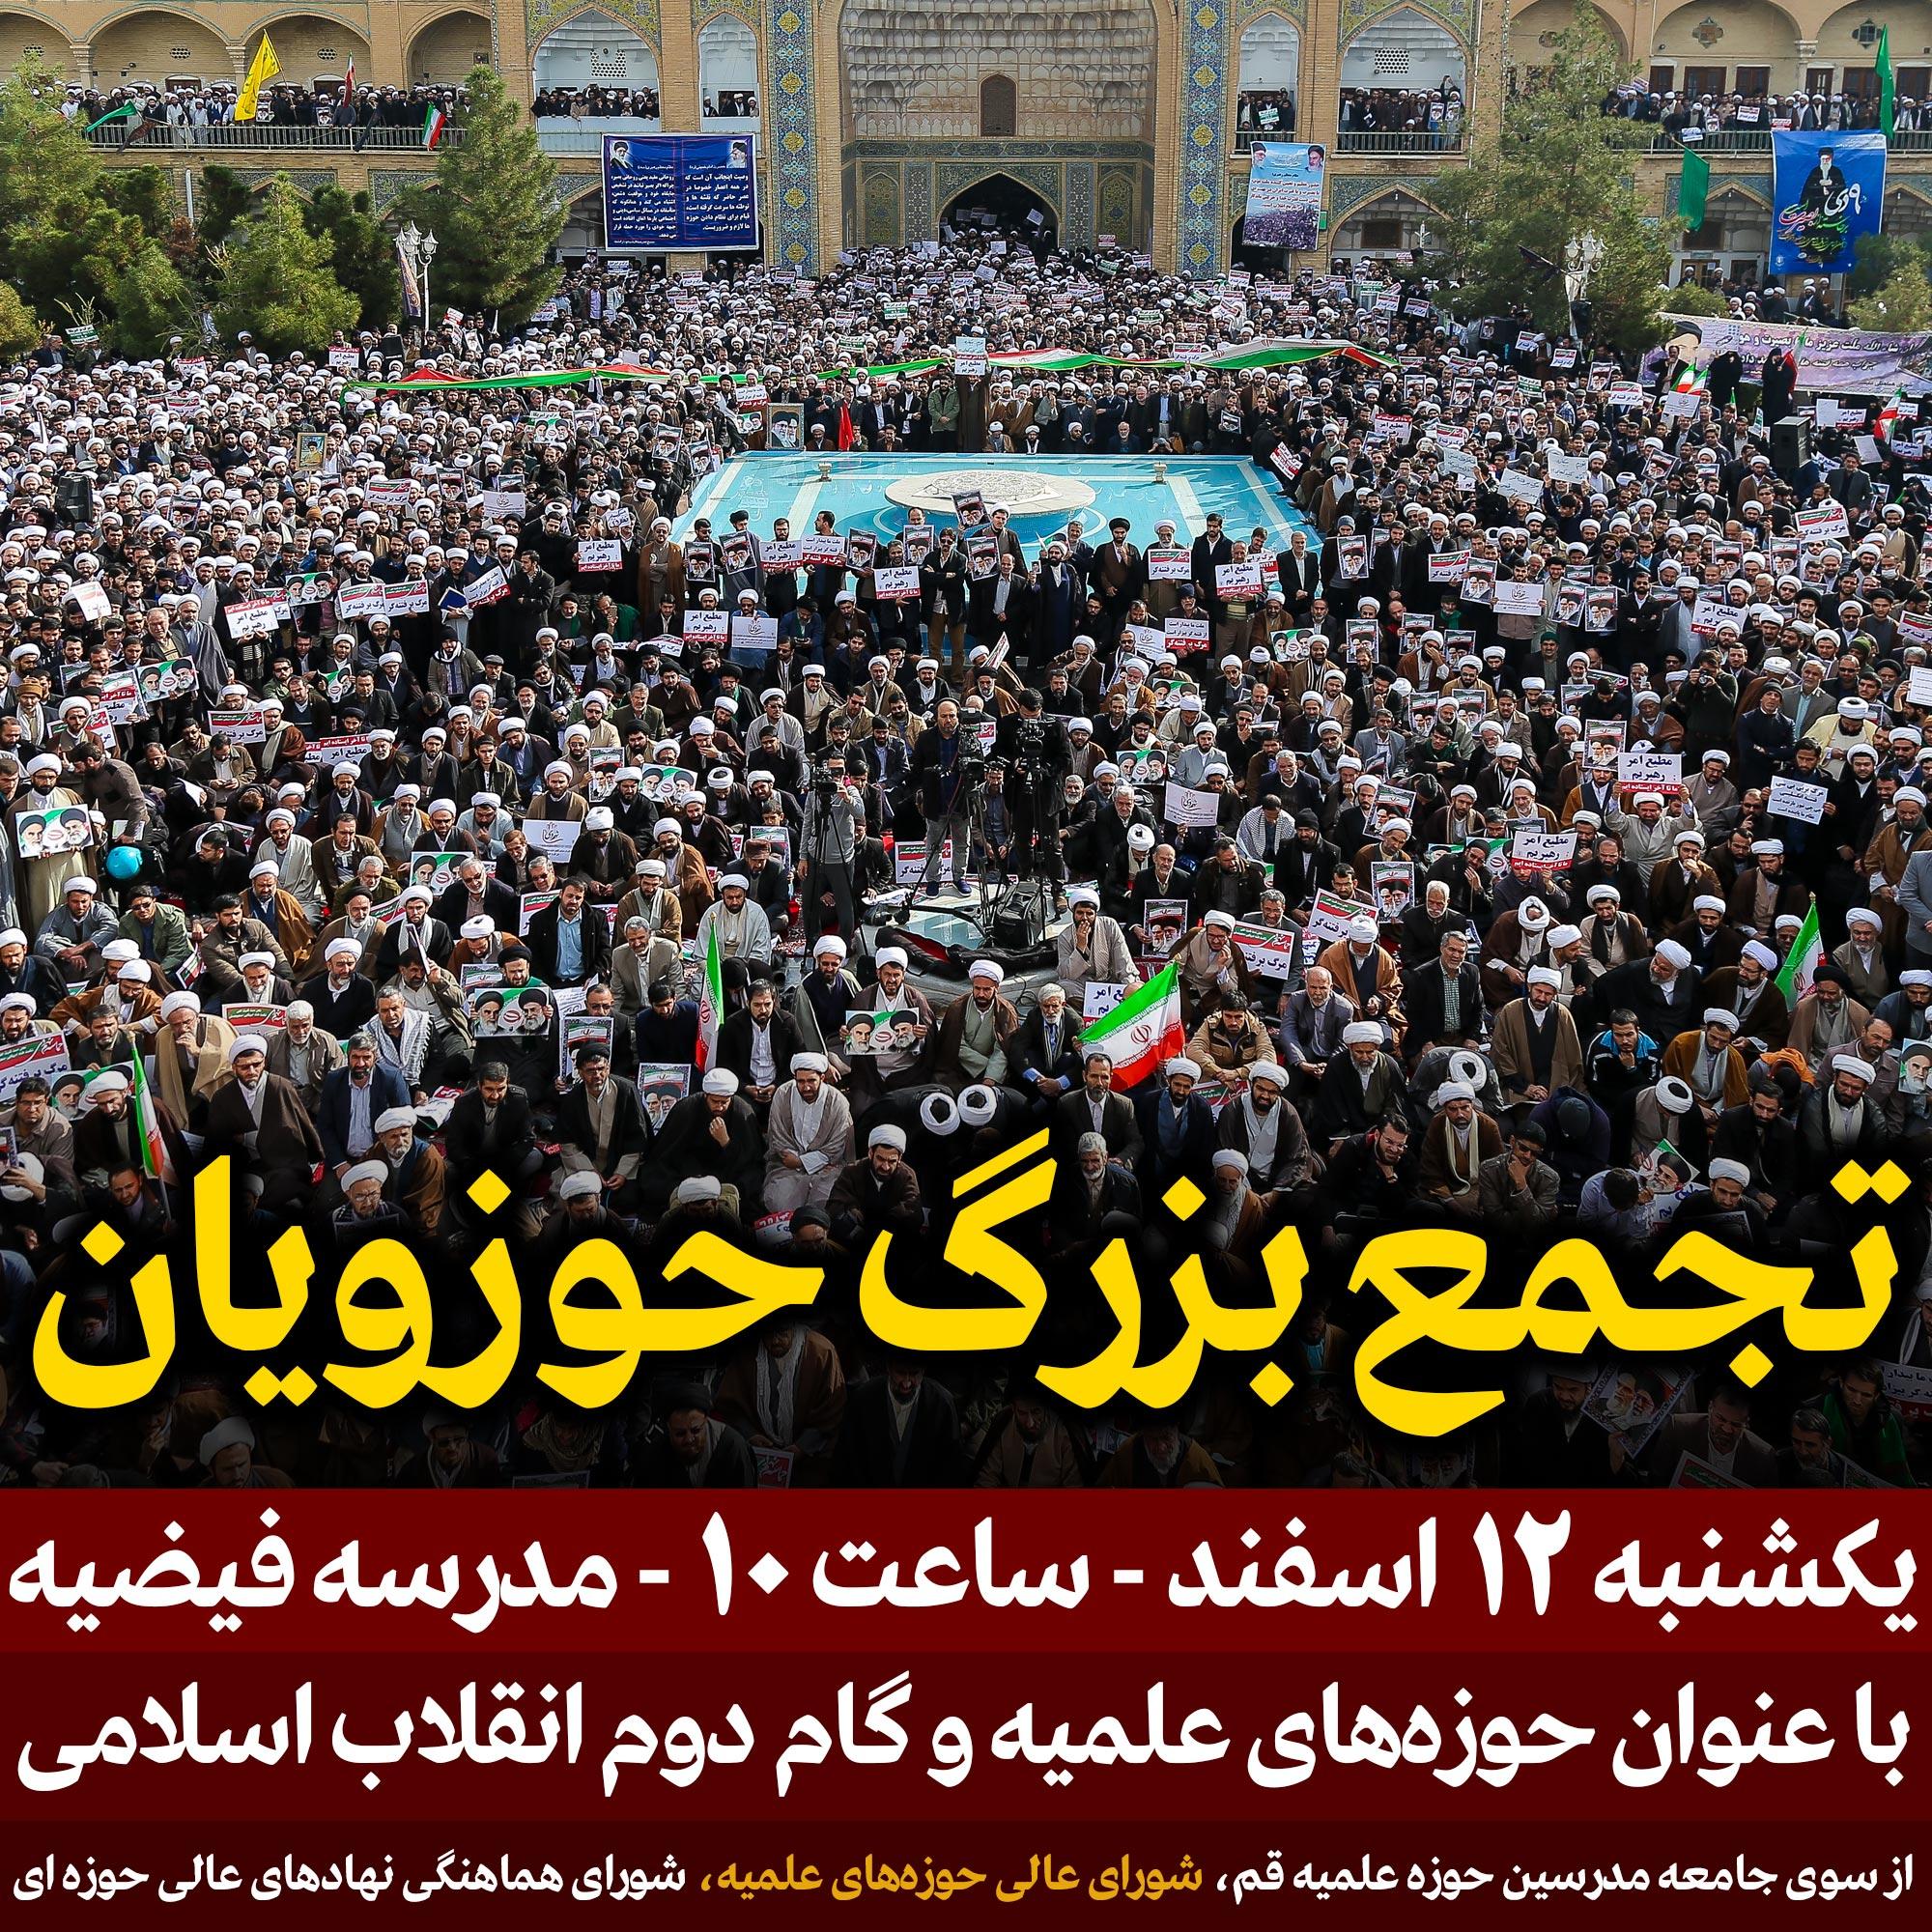 عکس نوشته/ تجمع بزرگ حوزویان